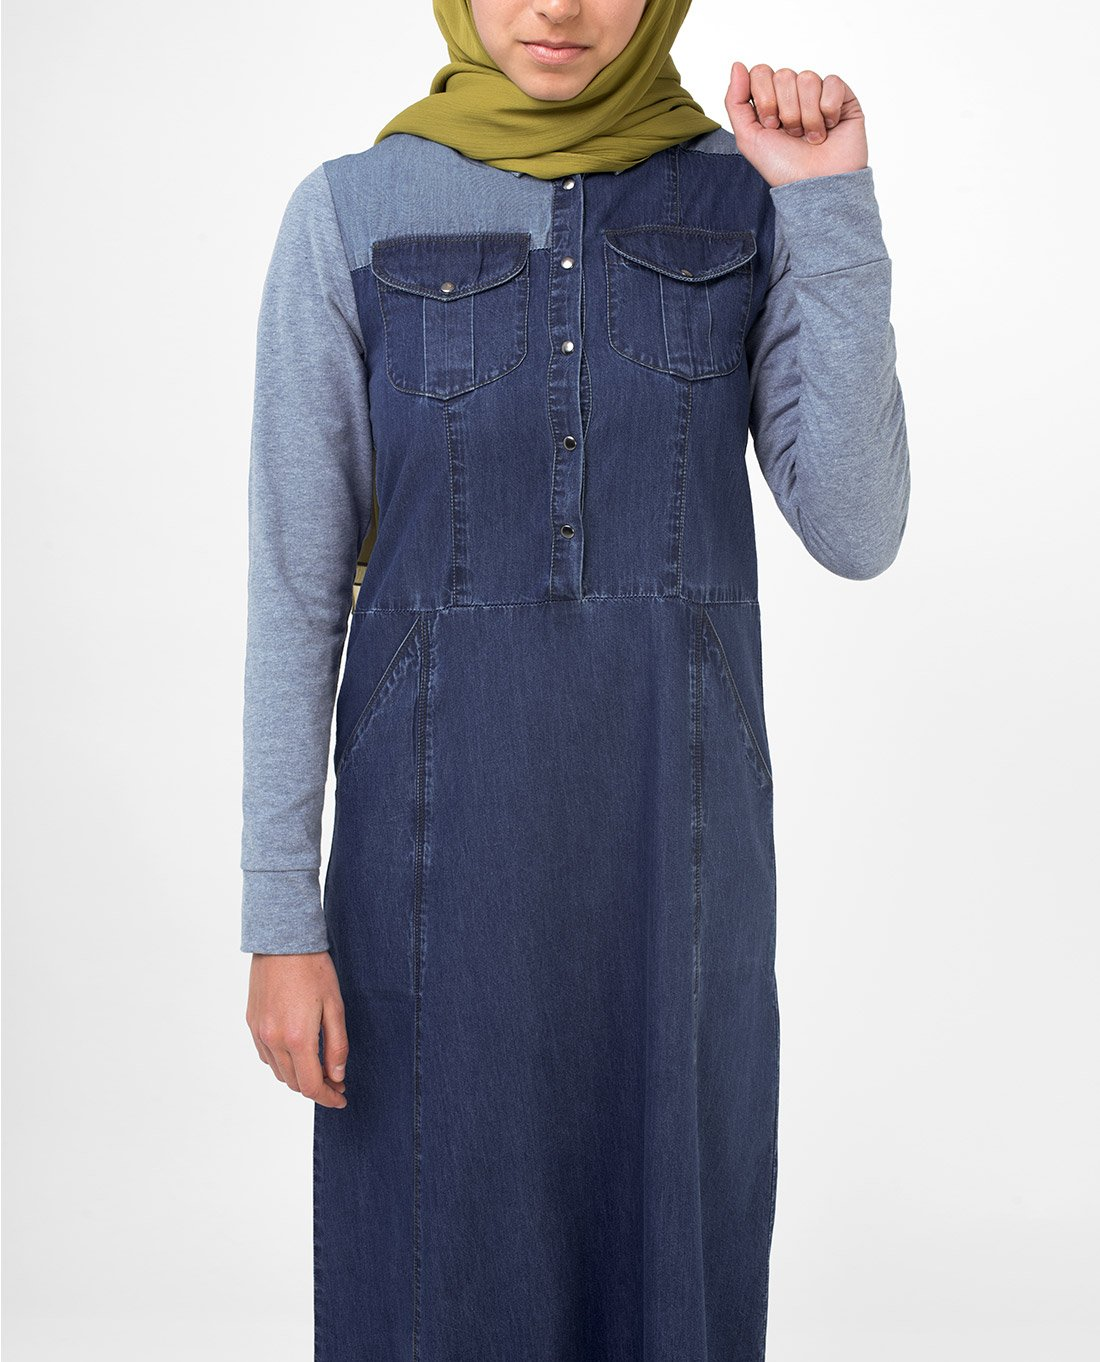 Silk Route Grey Contrast Fine Denim Maxi Dress Jilbab Medium 56 by Silk Route (Image #4)